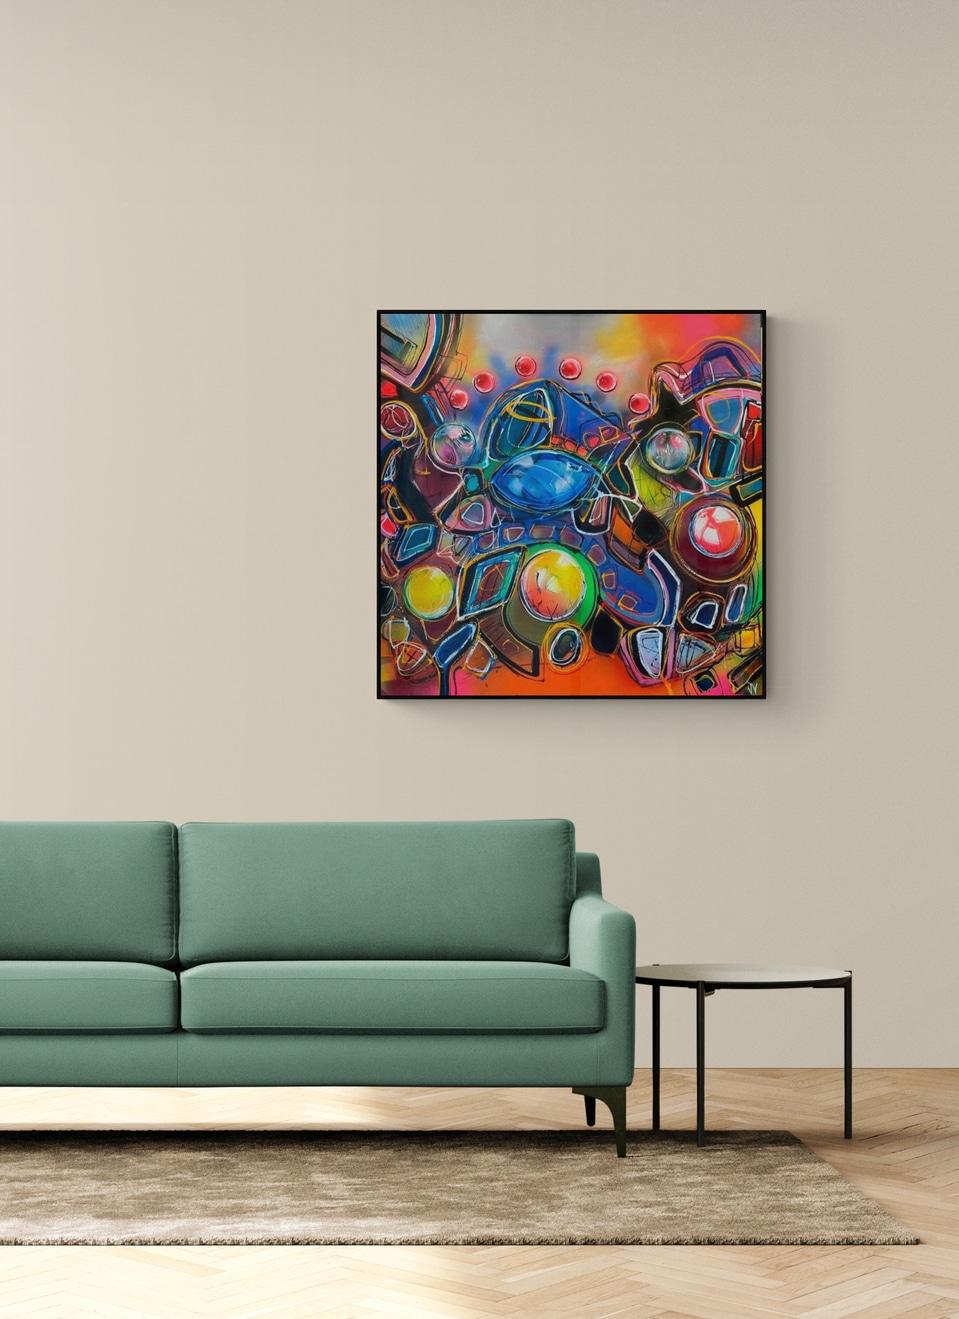 Colours Fly - Jogchum Veenstra